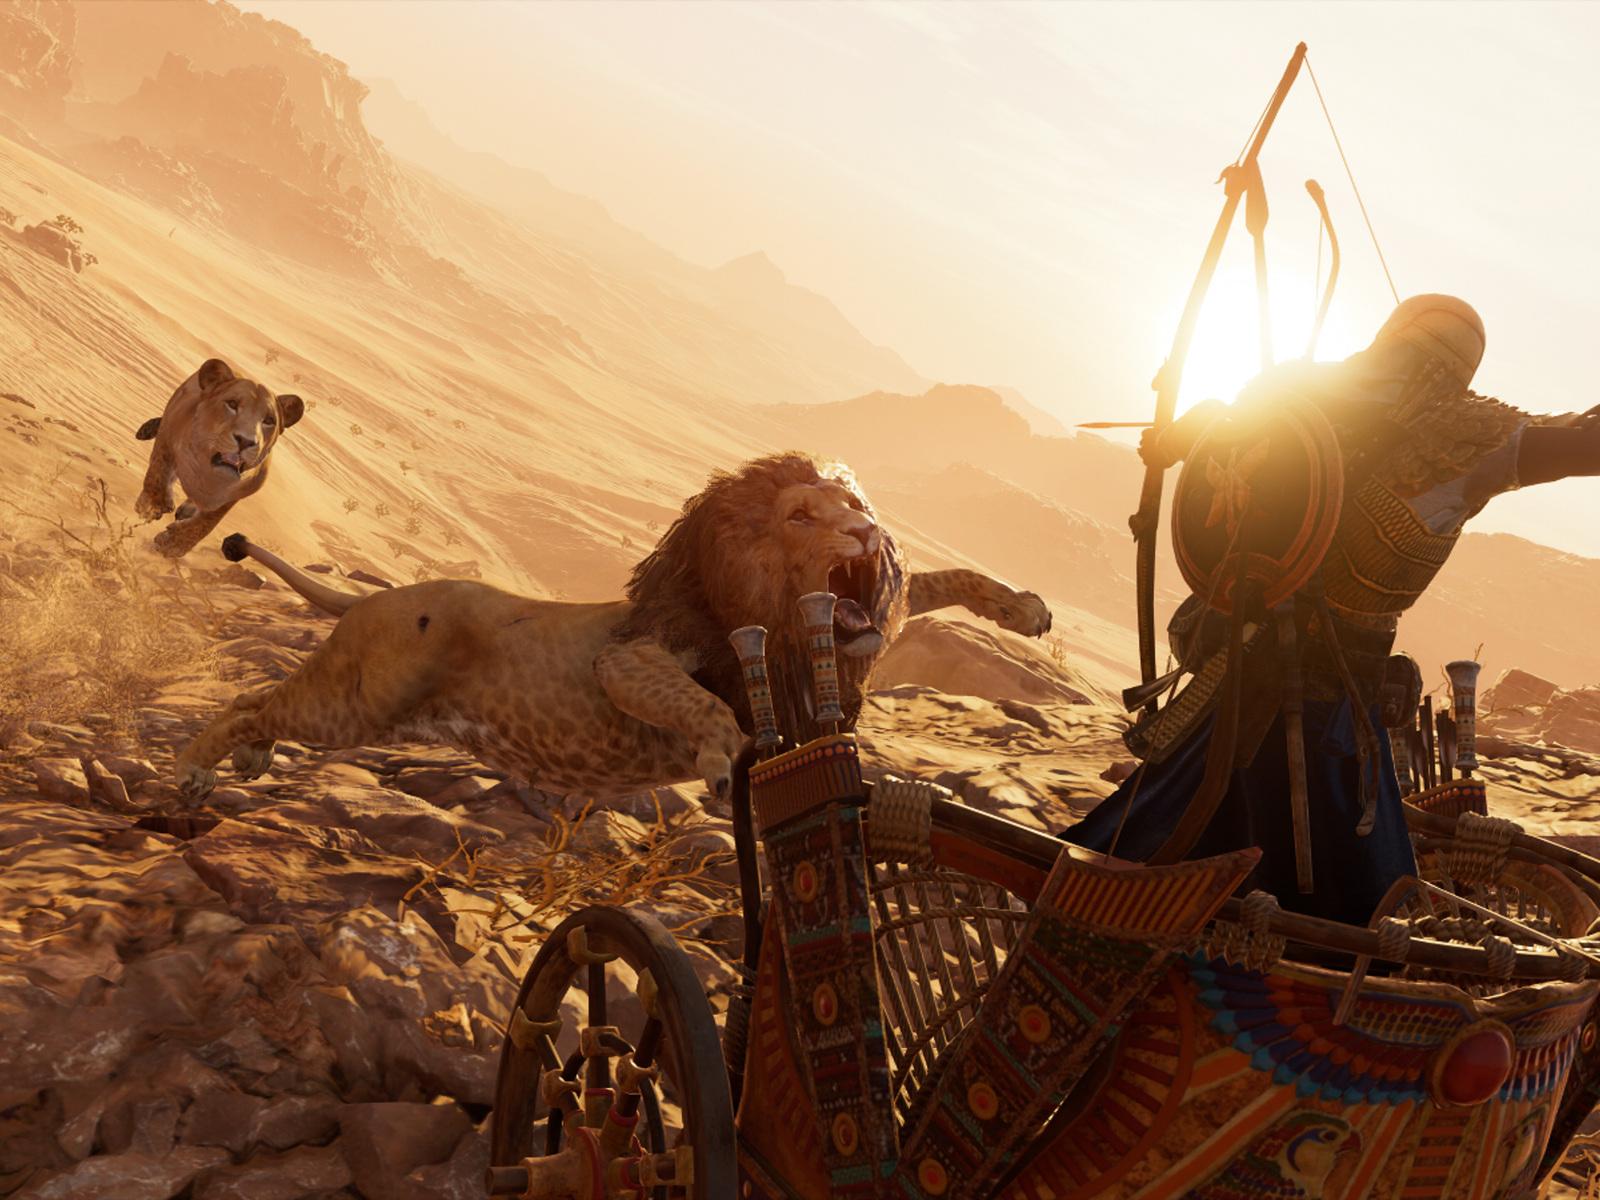 lions-assassins-creed-origins-4k-ui.jpg